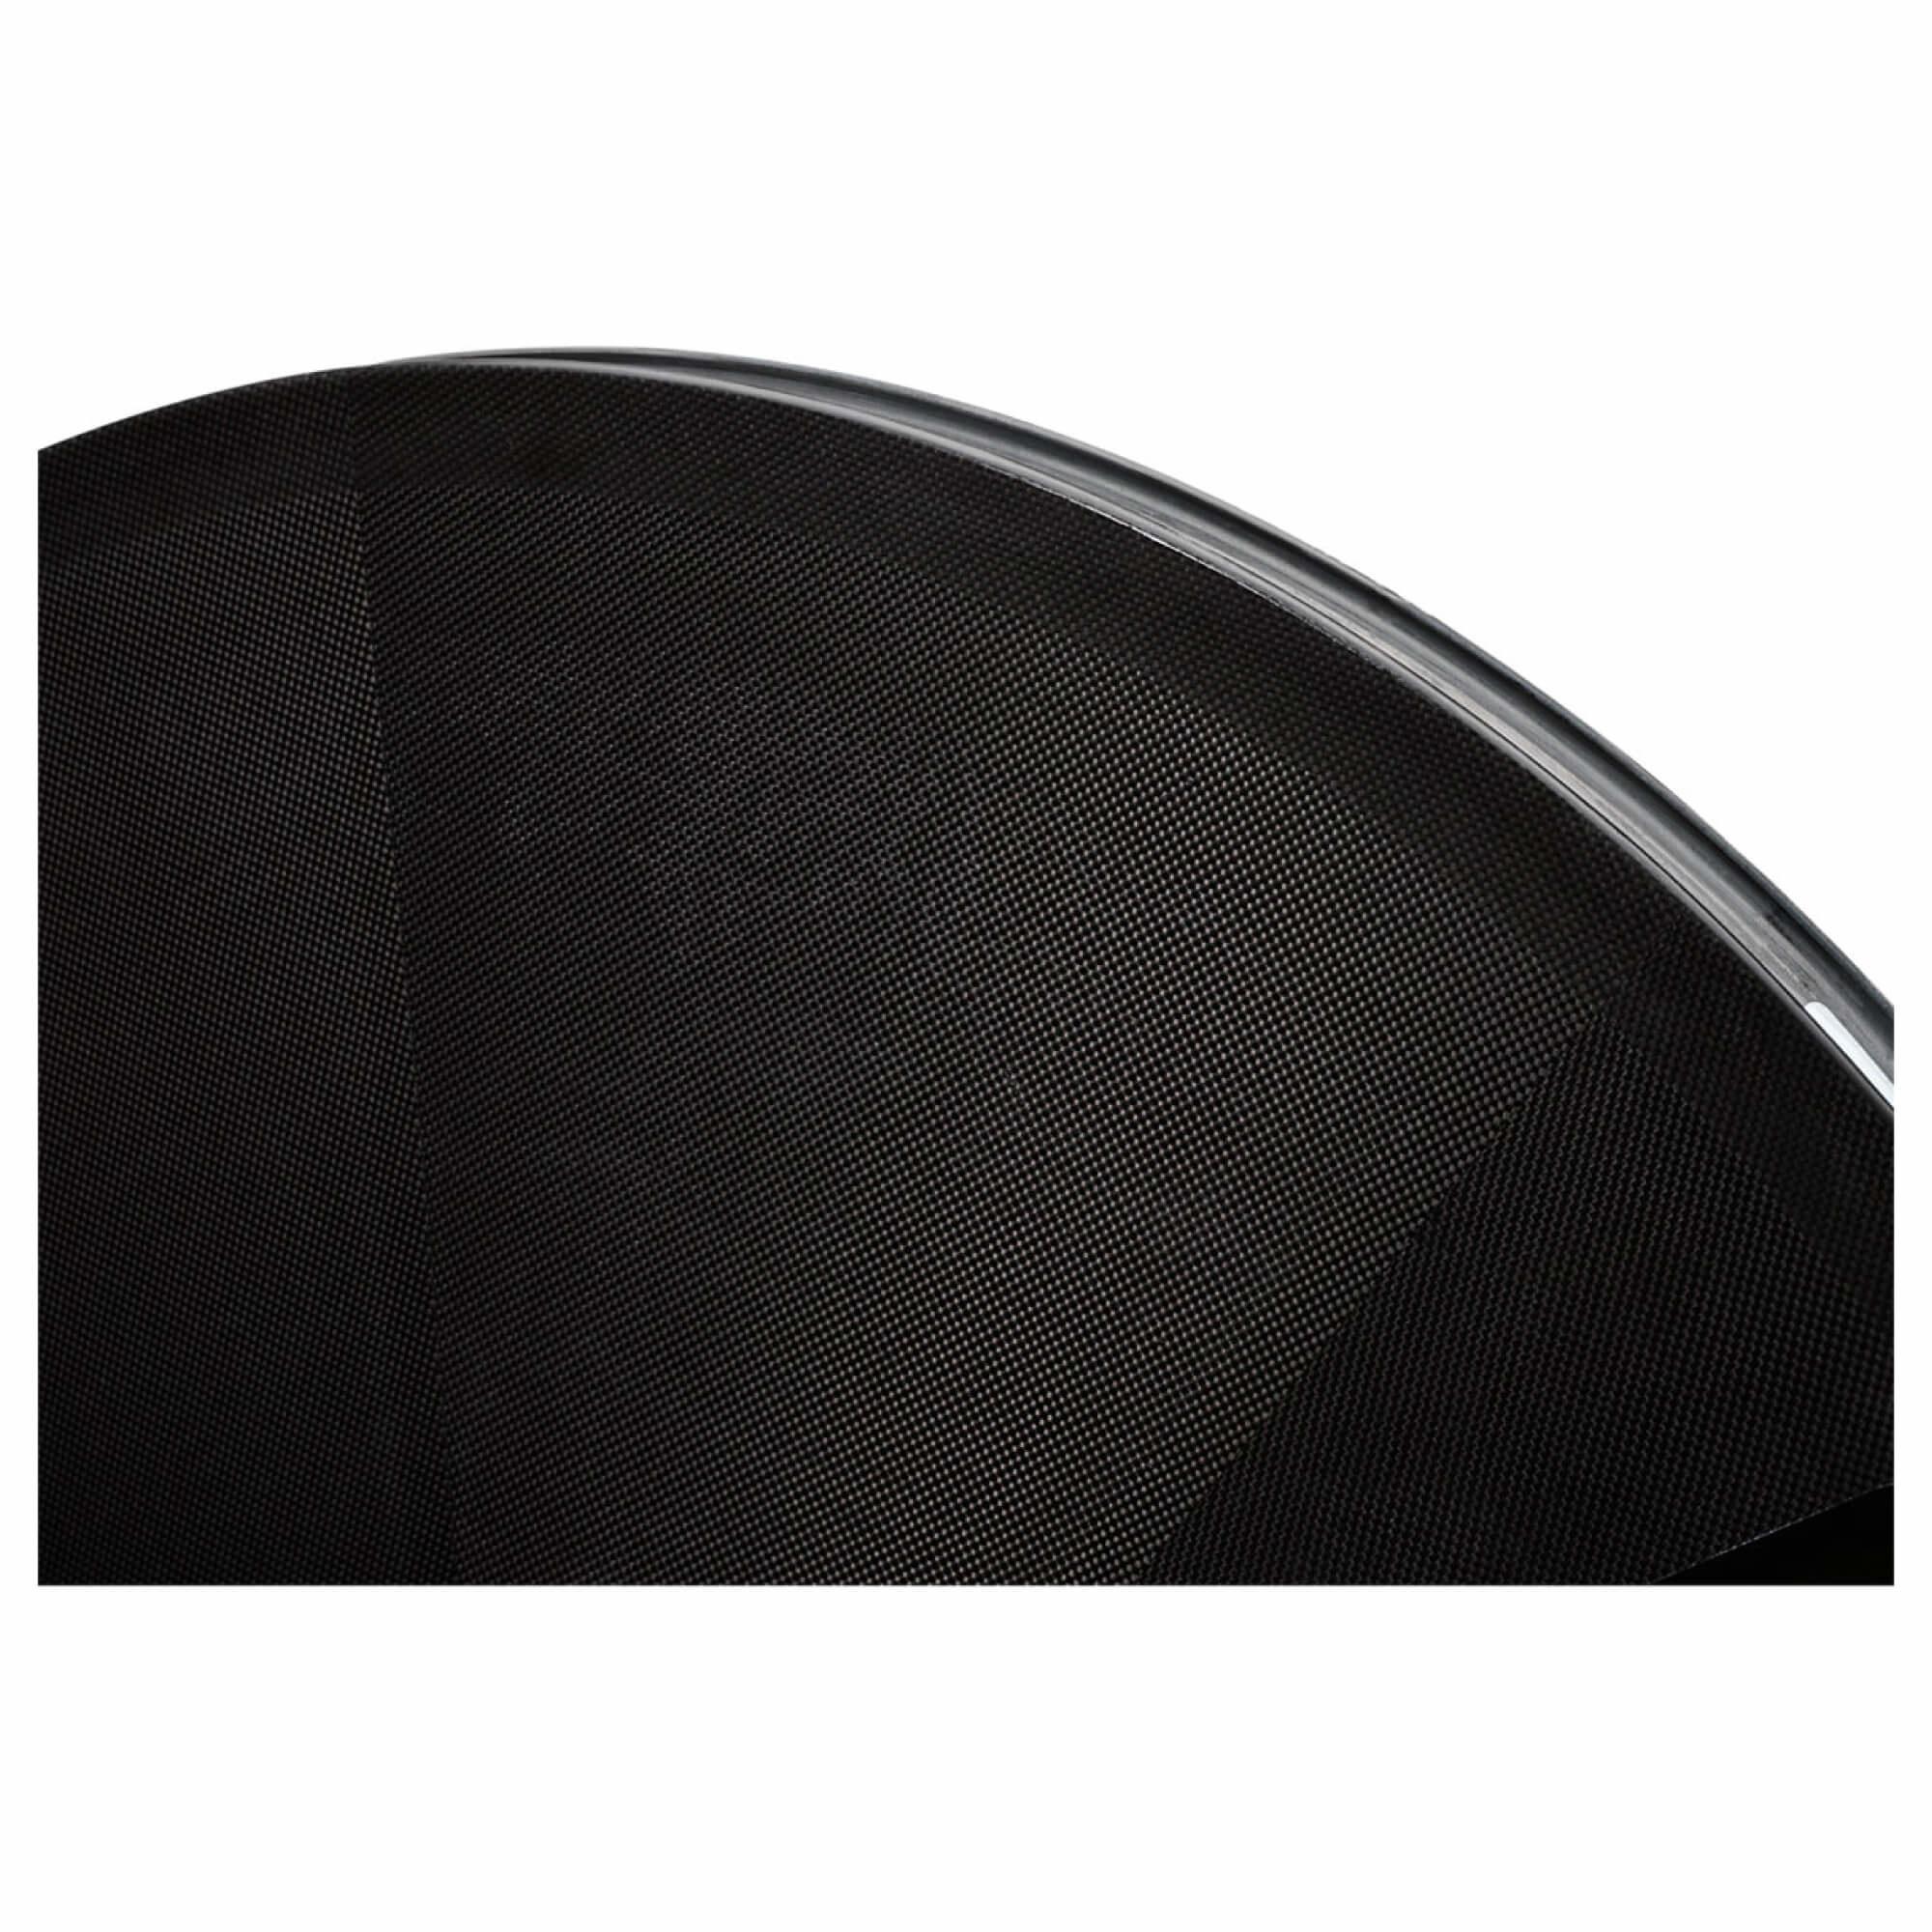 Roval 321 Disc Carbon/Gloss White - Disc Brake 2021-2